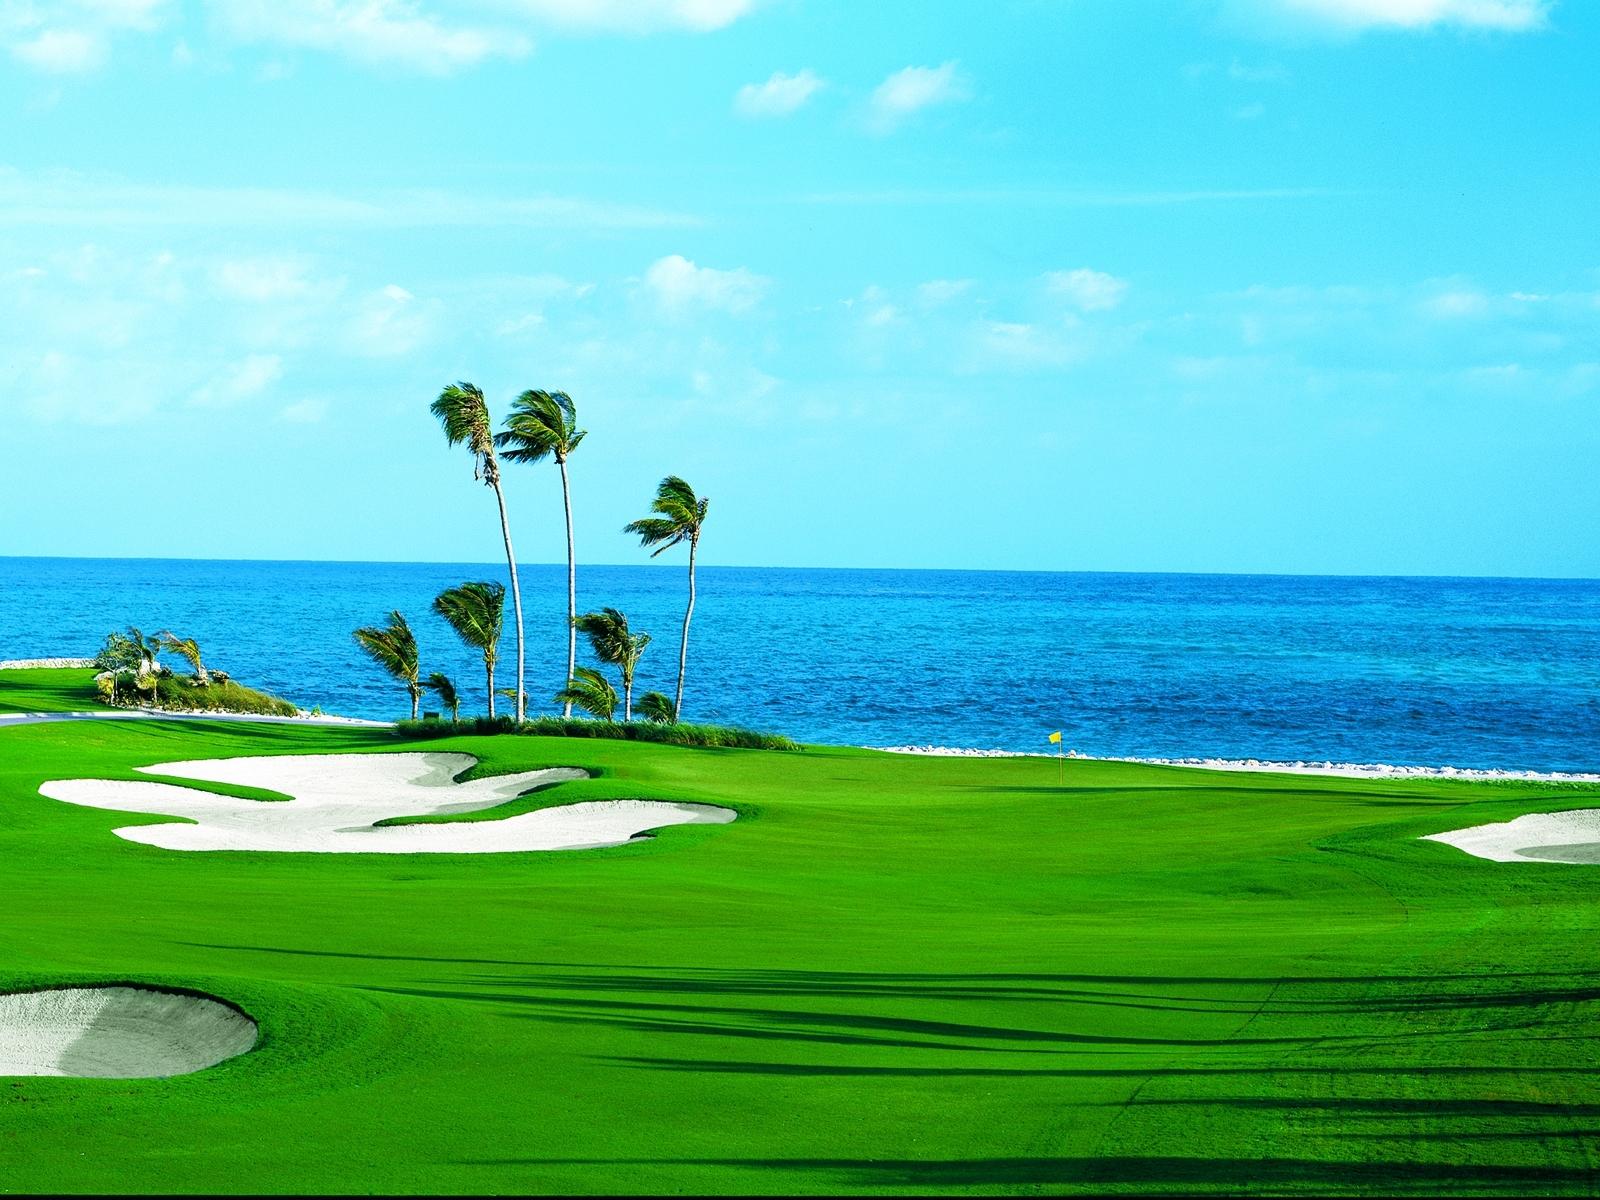 10 top golf course desktop wallpapers full hd 1920×1080 for pc desktop